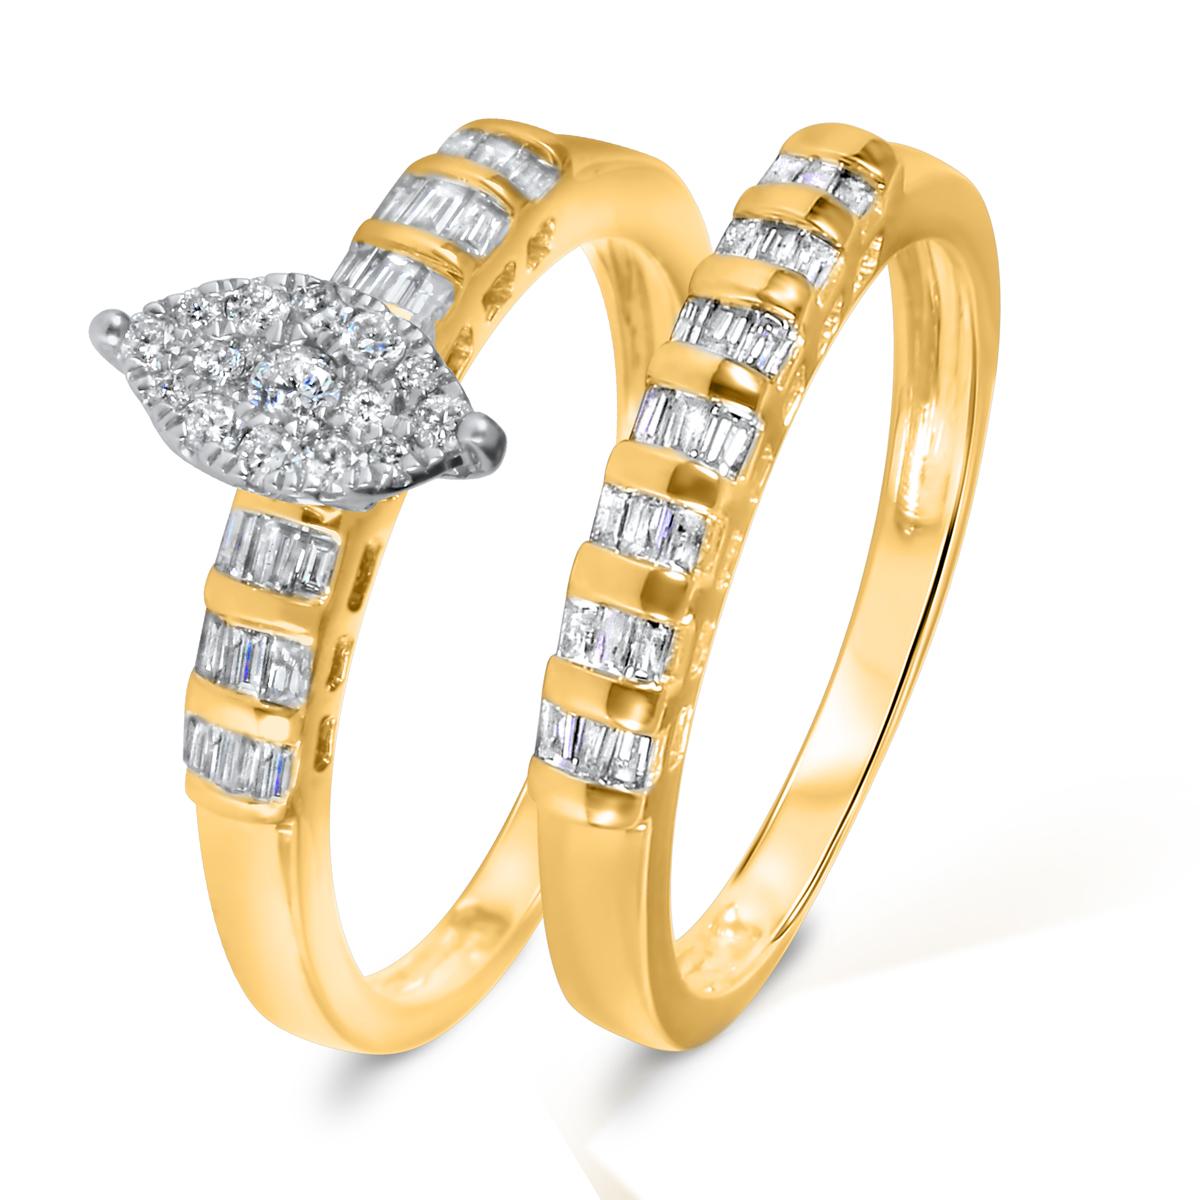 2/3 CT. T.W. Diamond Women's Bridal Wedding Ring Set 14K Yellow Gold